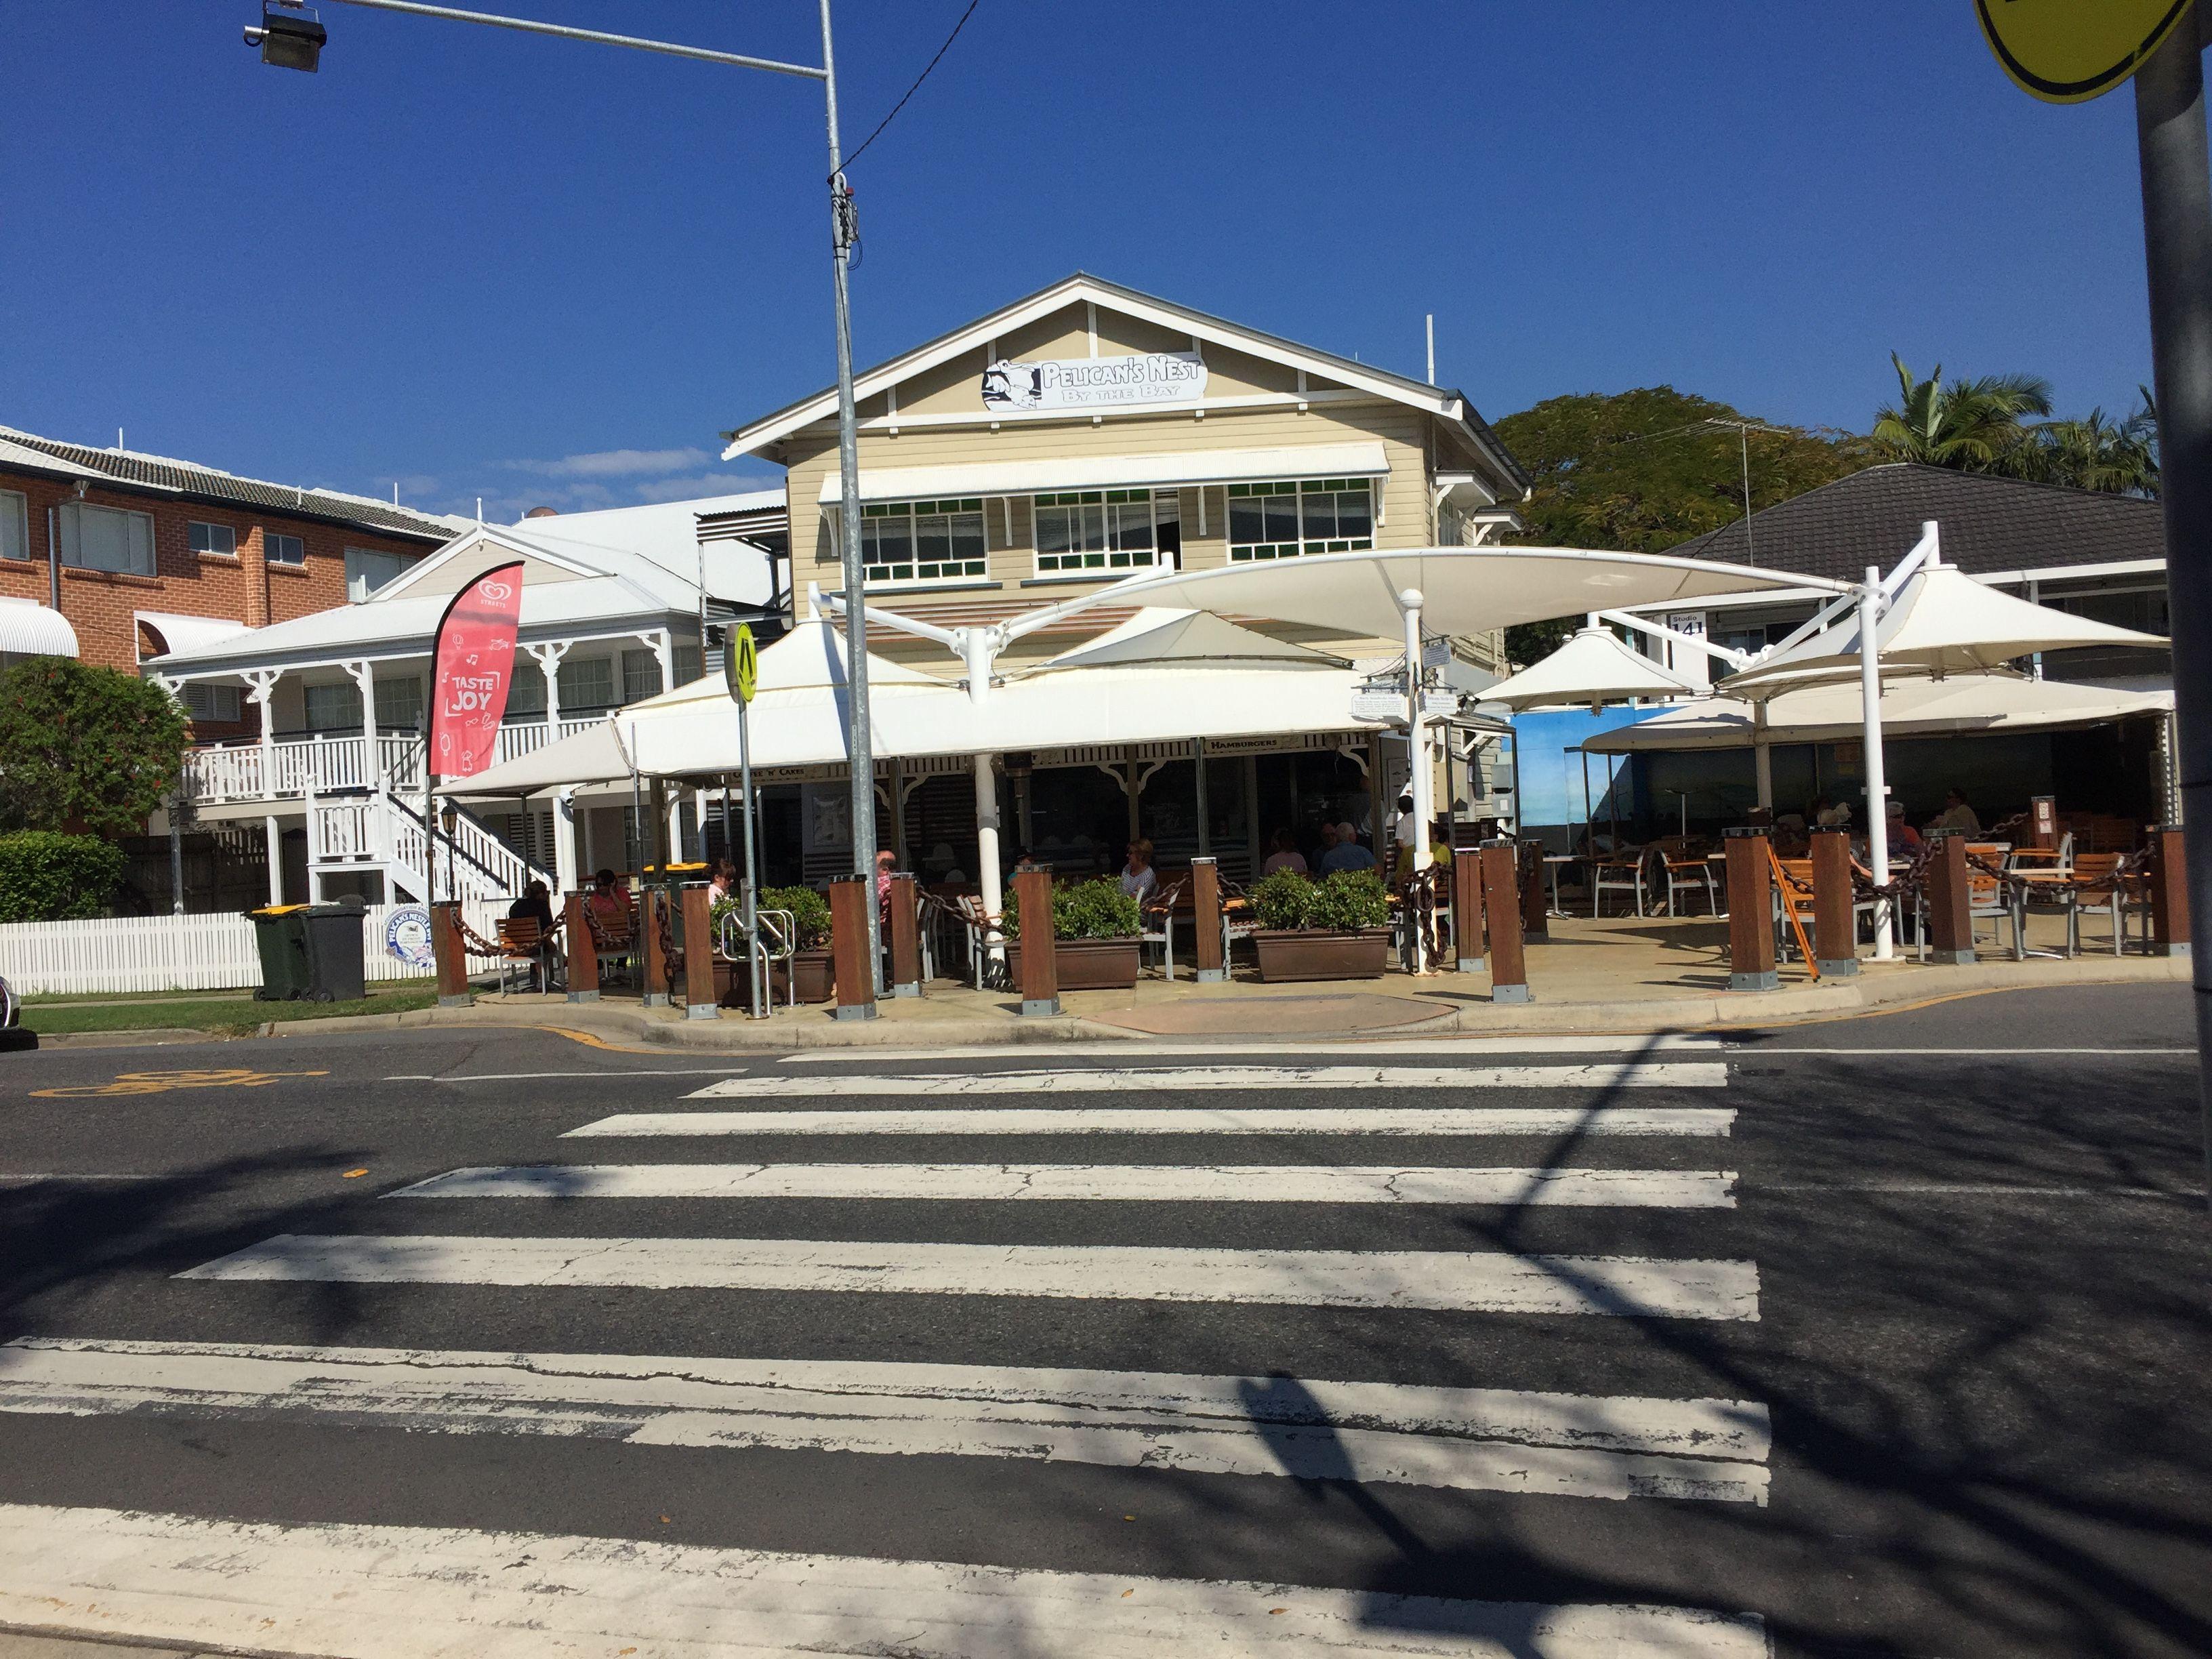 The Pelican's Nest Cafe at Wynnum, Brisbane, QLD - right on Moreton Bay